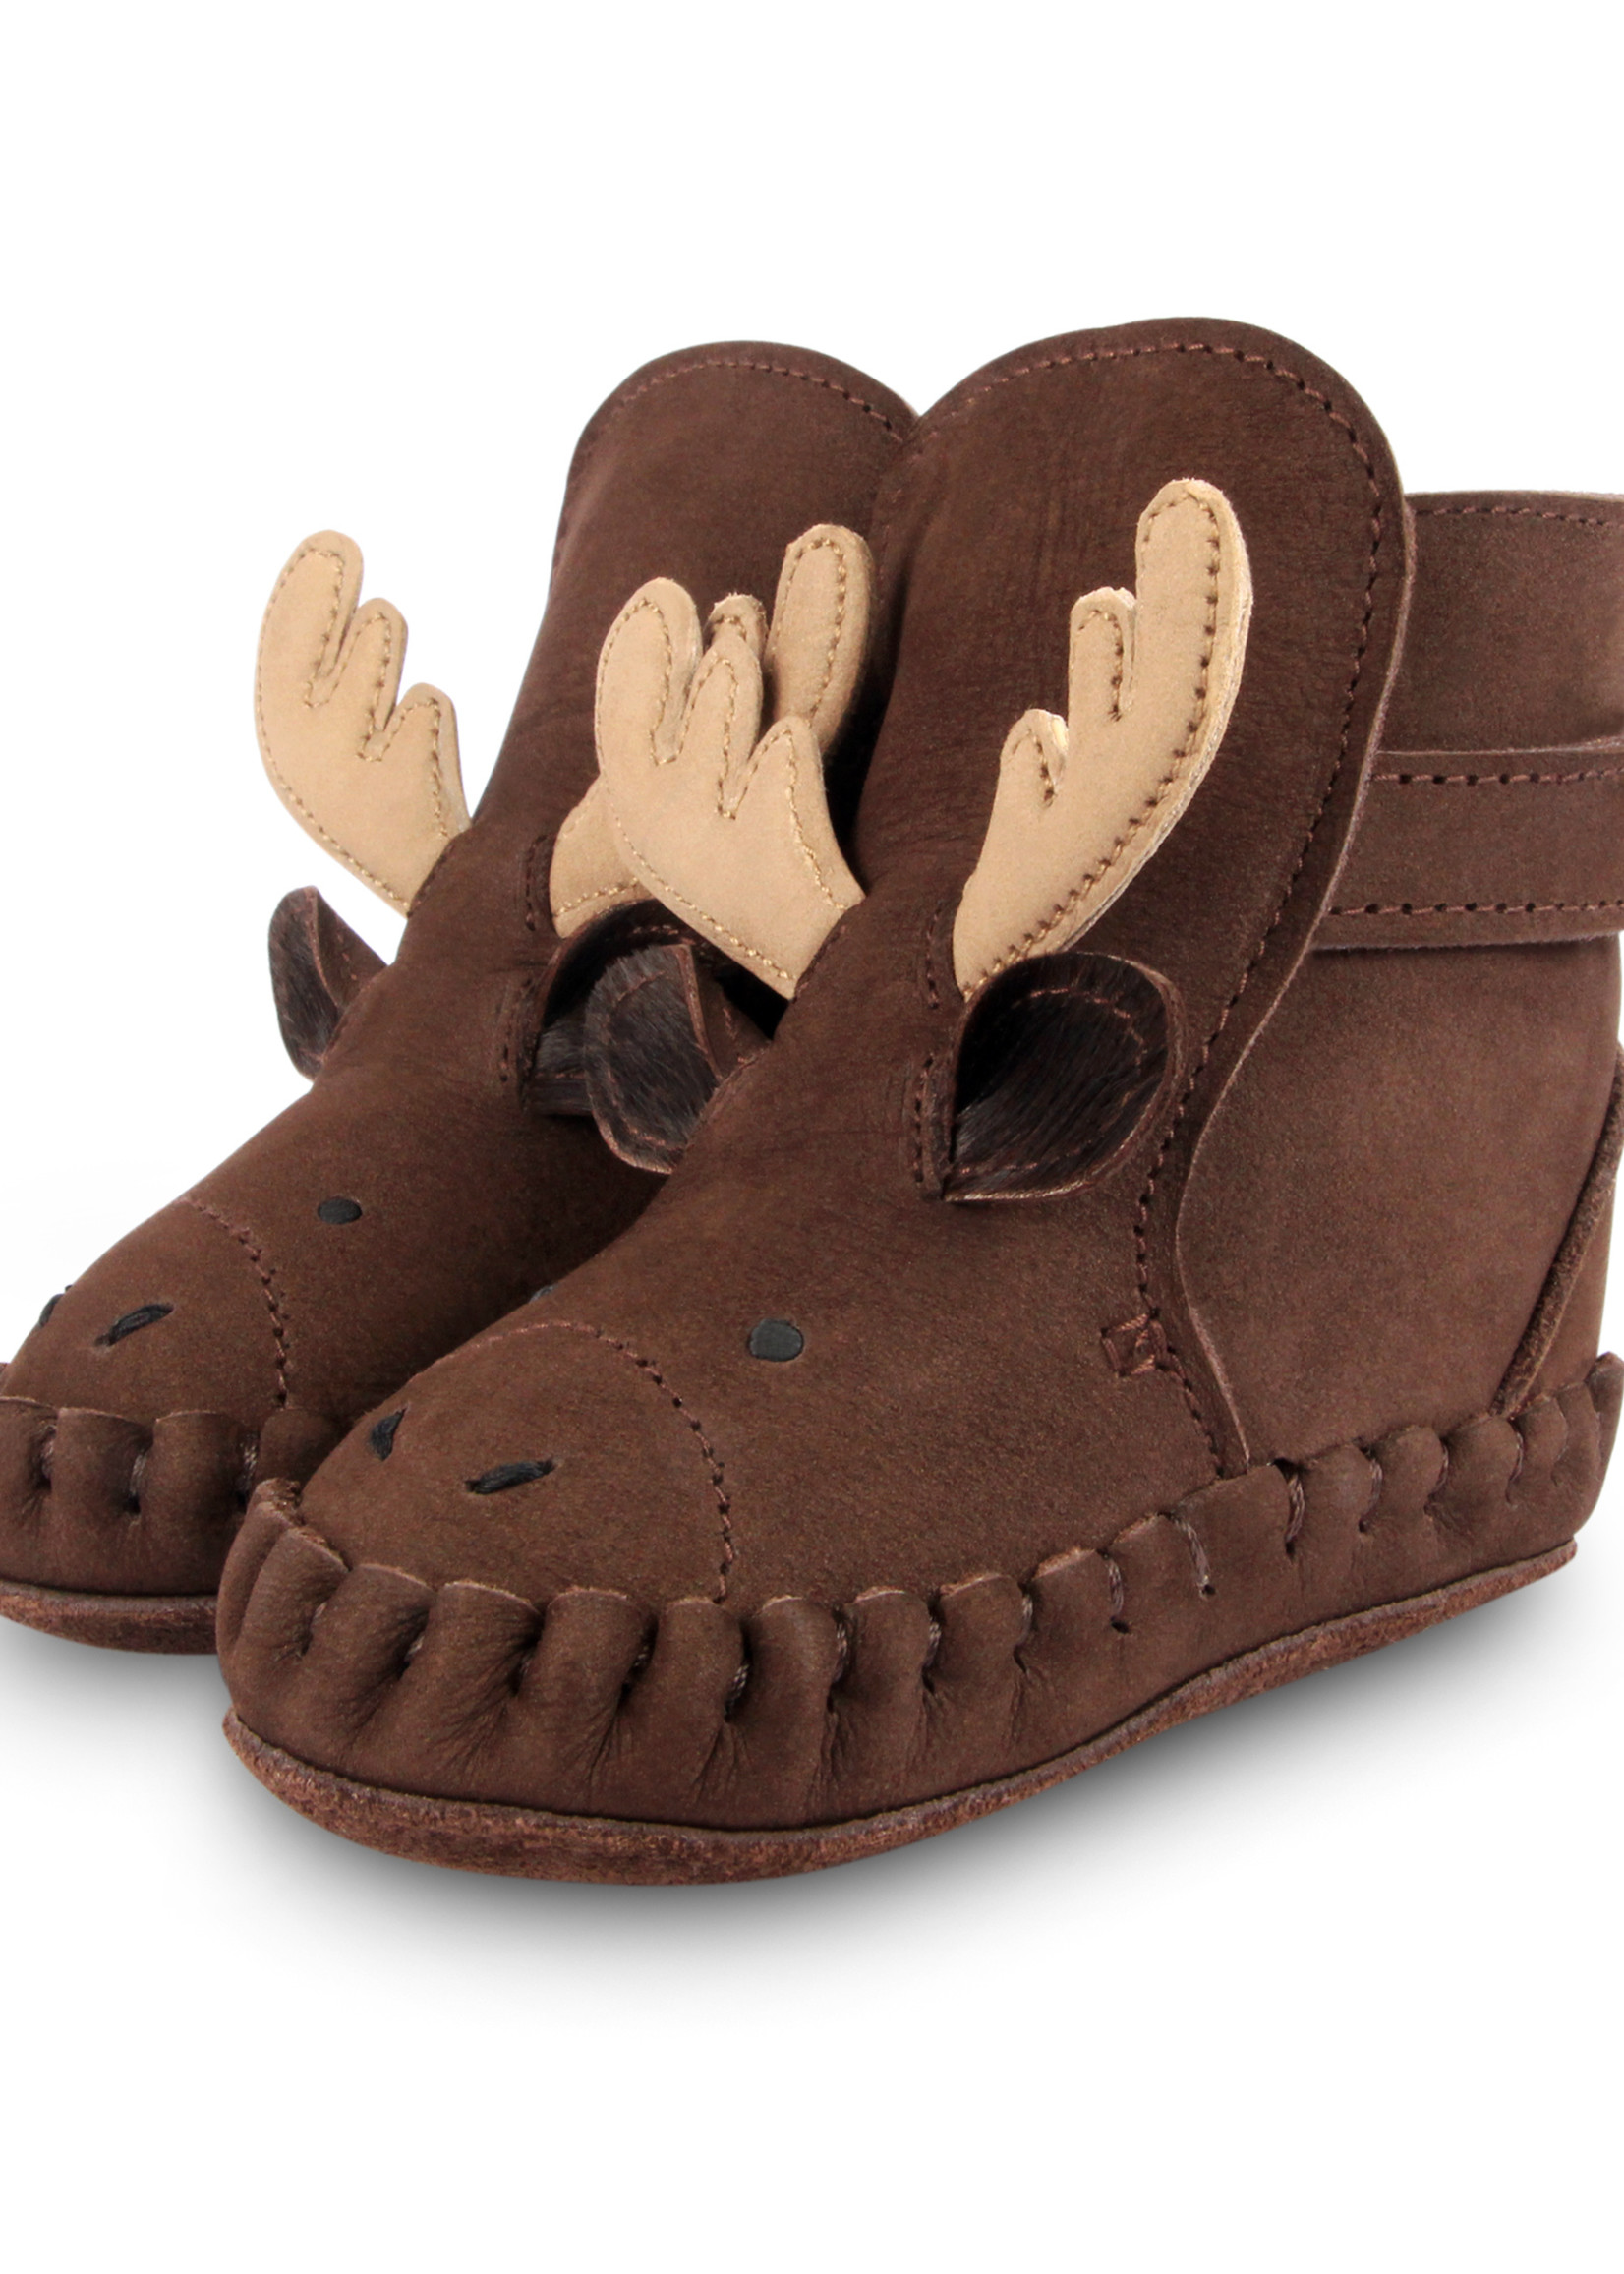 Donsje Amsterdam Kapi Exclusive Lining - Moose Chocolate Nubuck